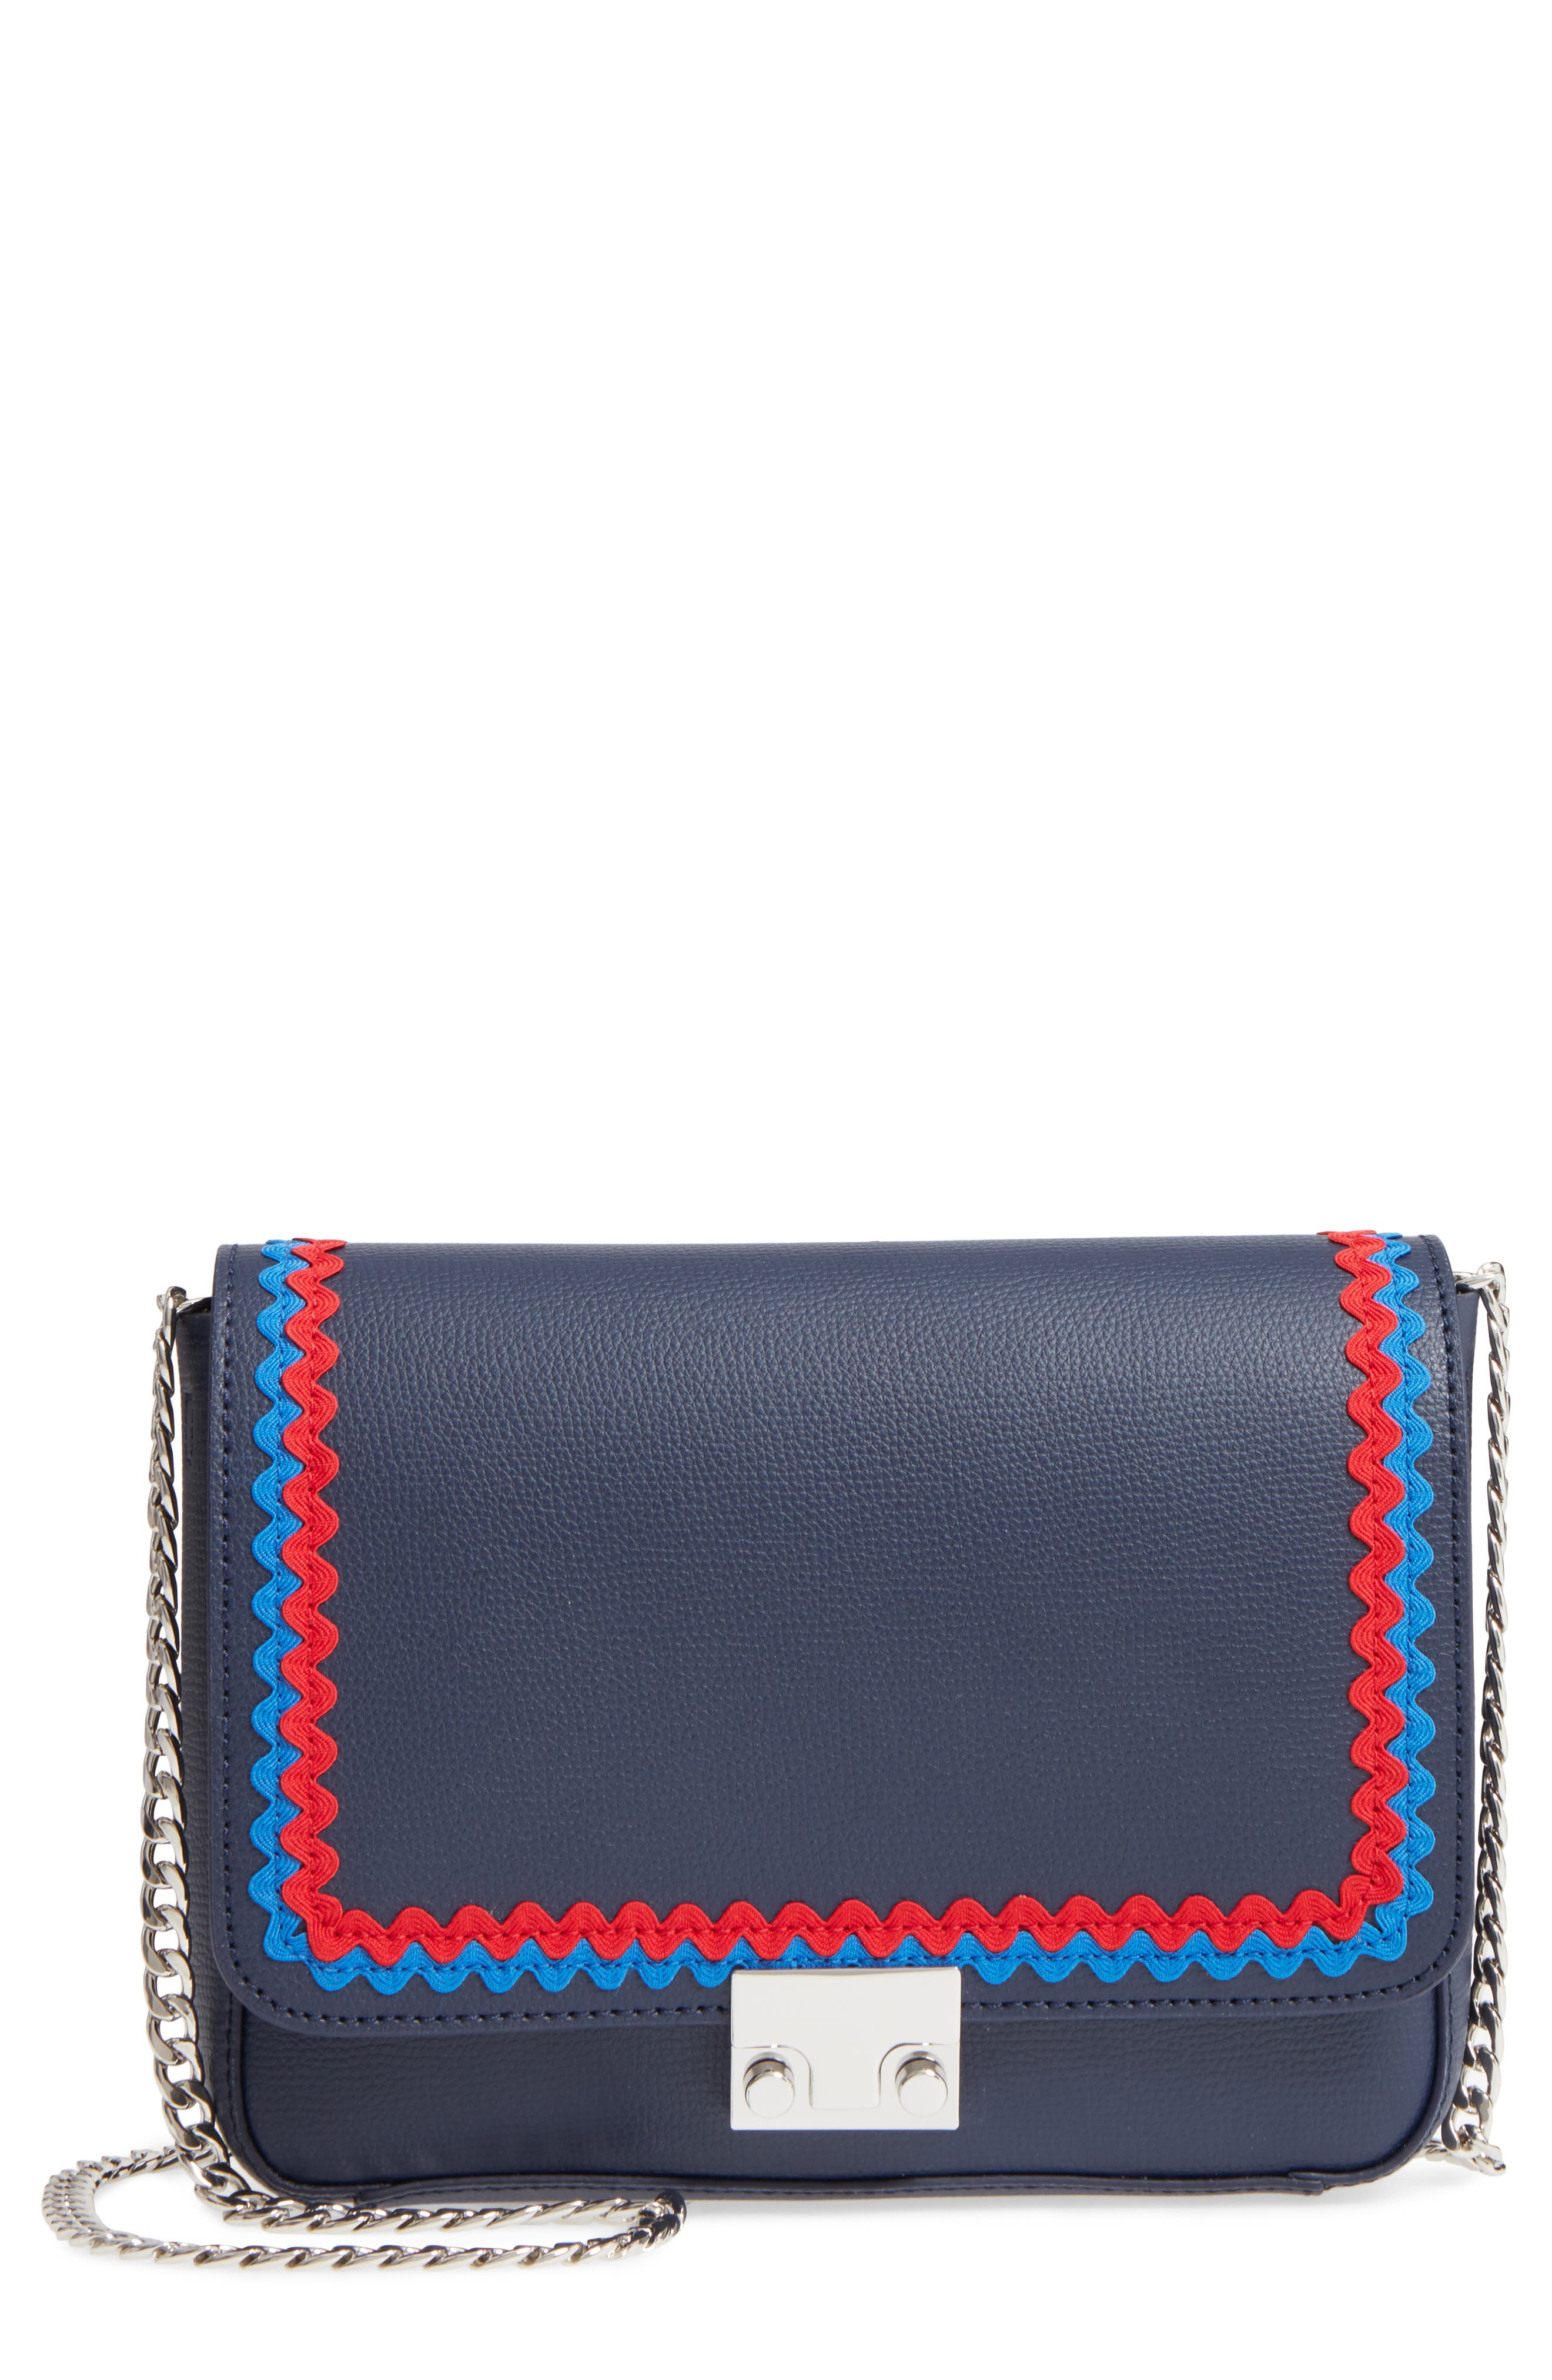 Lock Leather Flap Clutch/Shoulder Bag,                         Main,                         color,